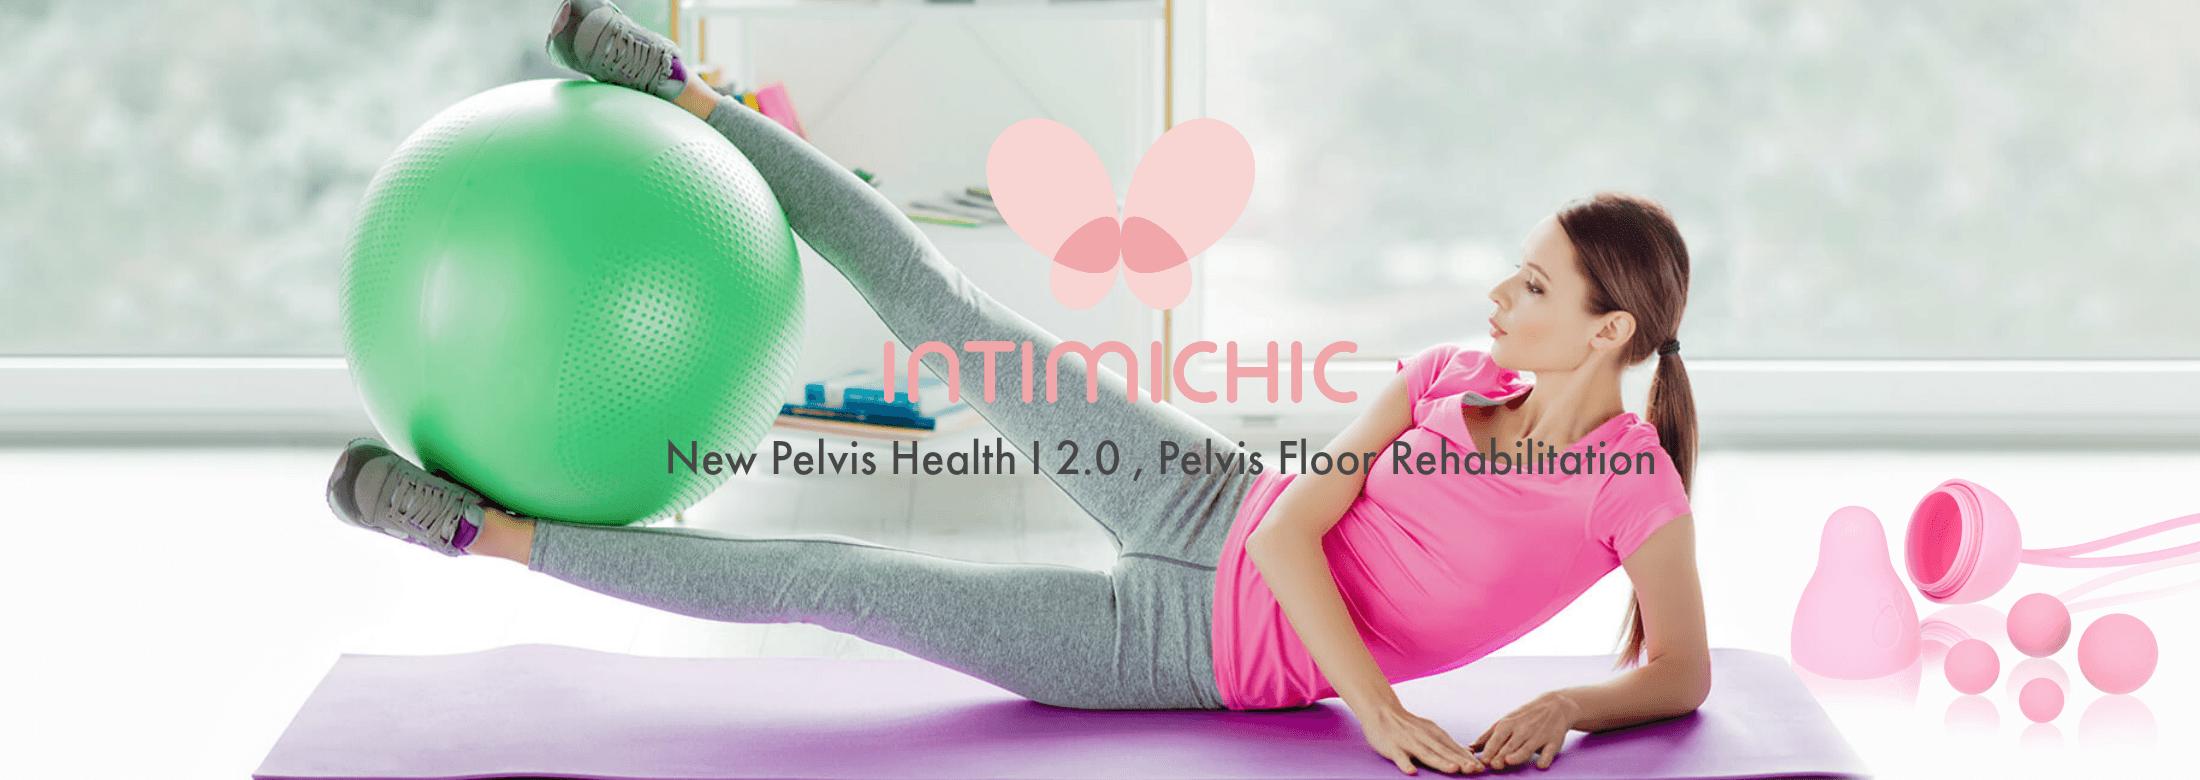 INTIMICHIC PELVIS HEALTH I 2.0 REHABILITACION PELVICA